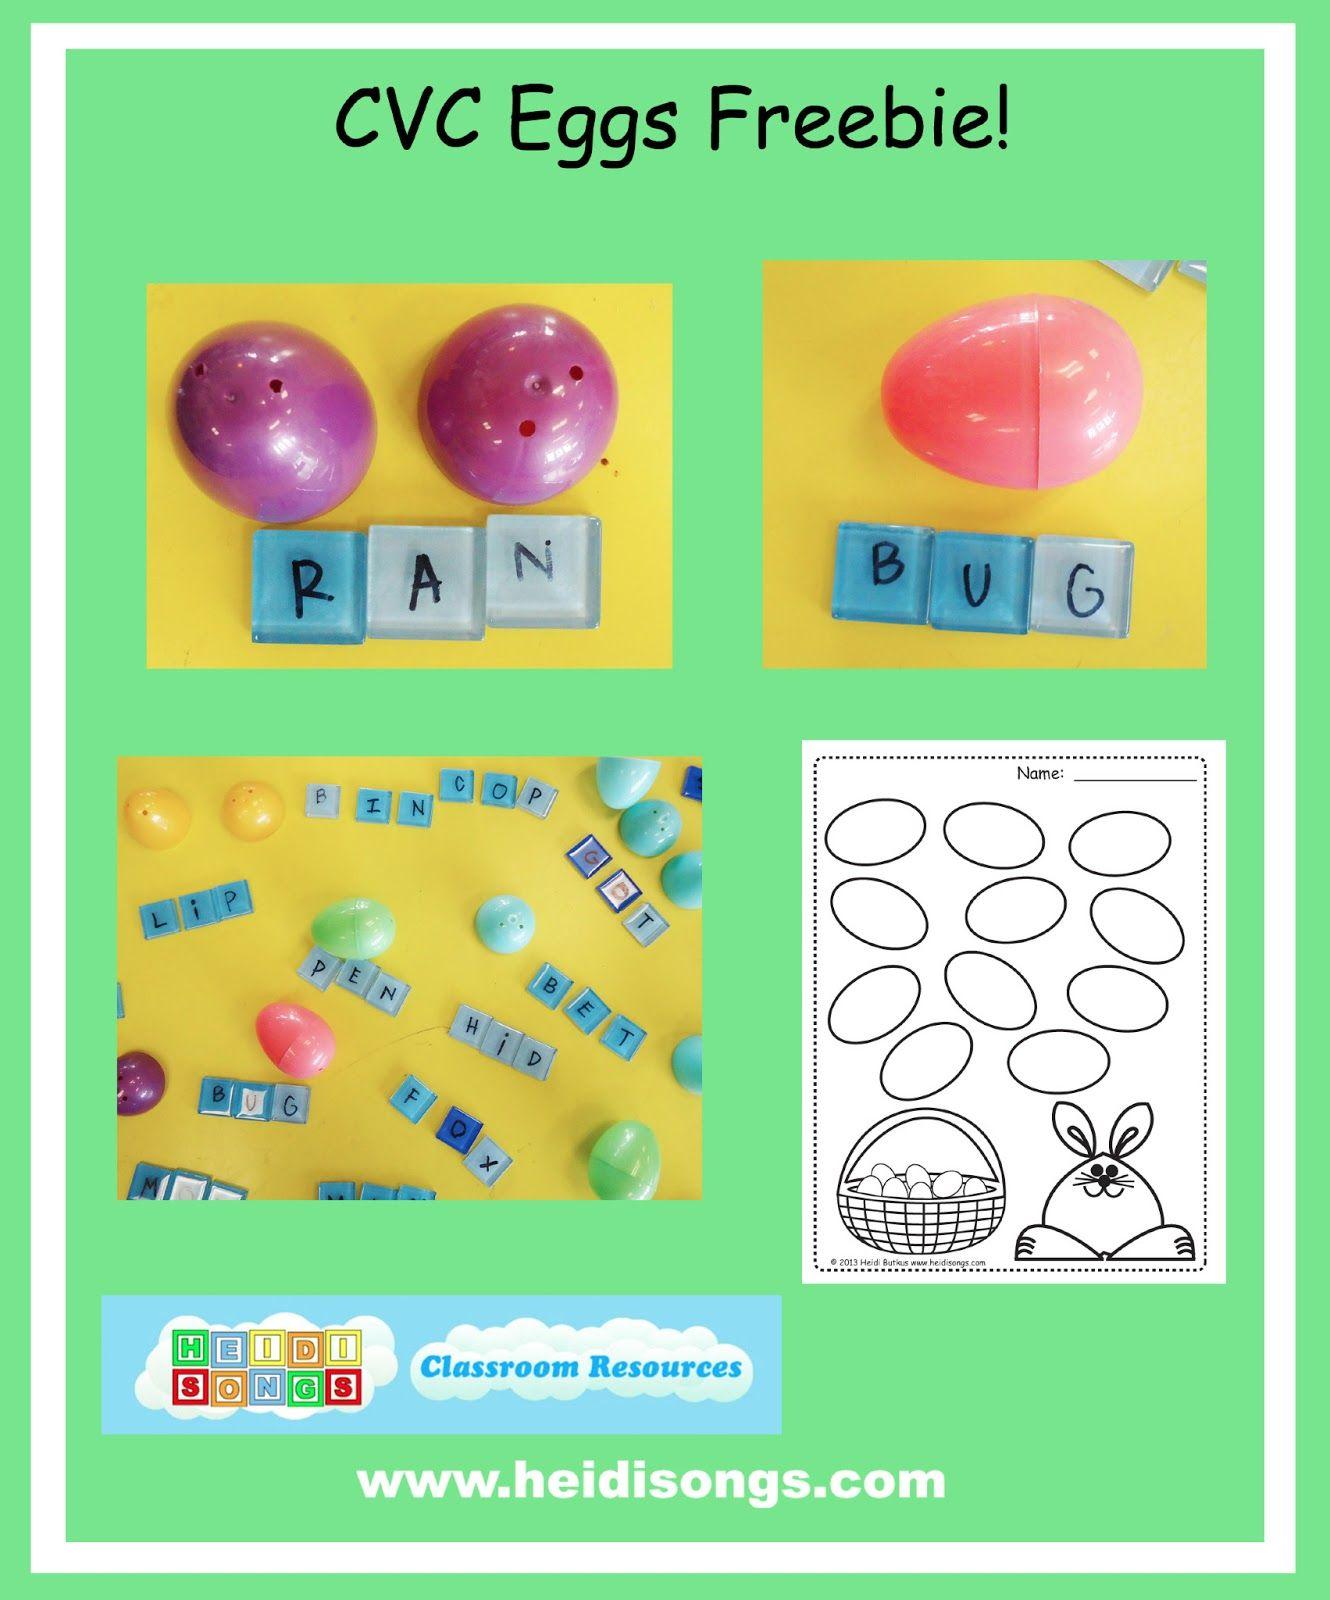 Cvc Eggs From Heidisongs Resource